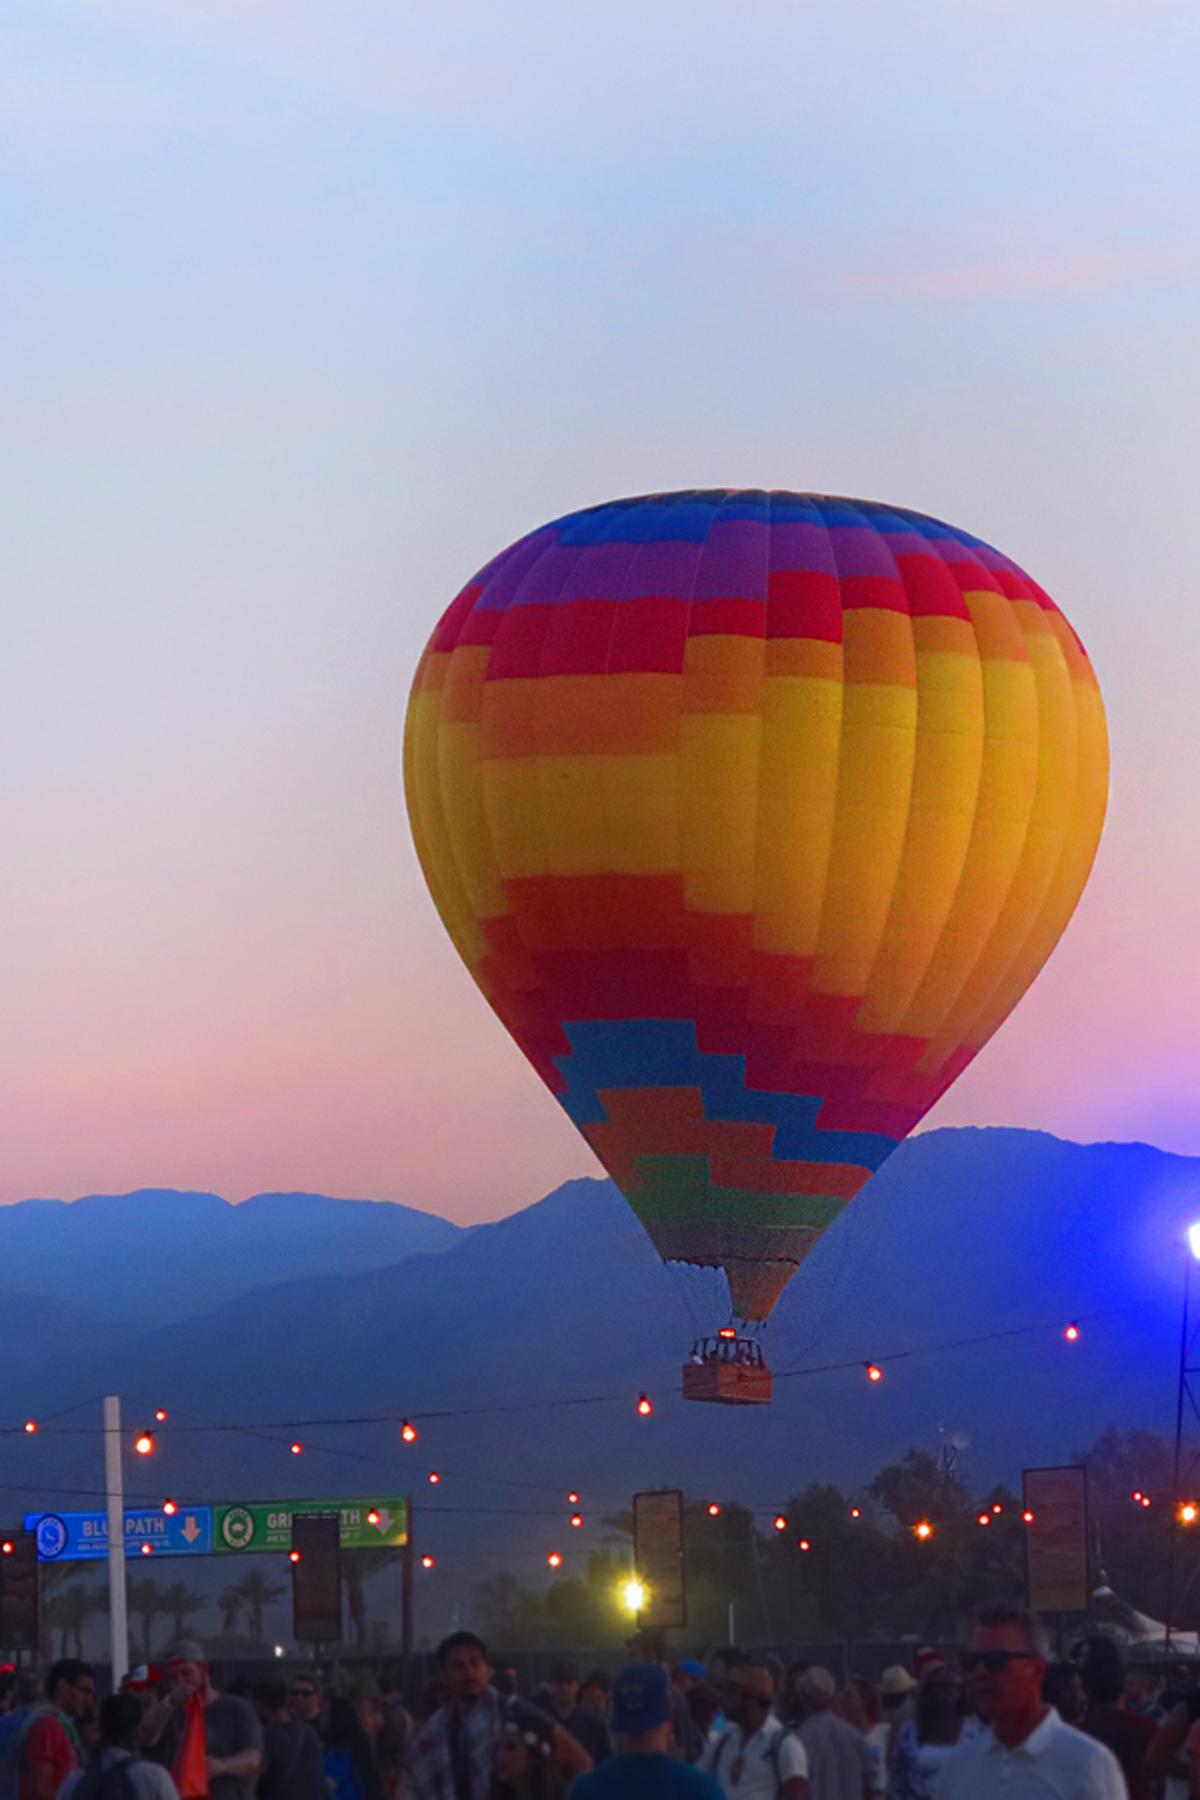 A Colorful Air Balloon Floats Above The Desert Landscape H M Loves Coachella Med Billeder